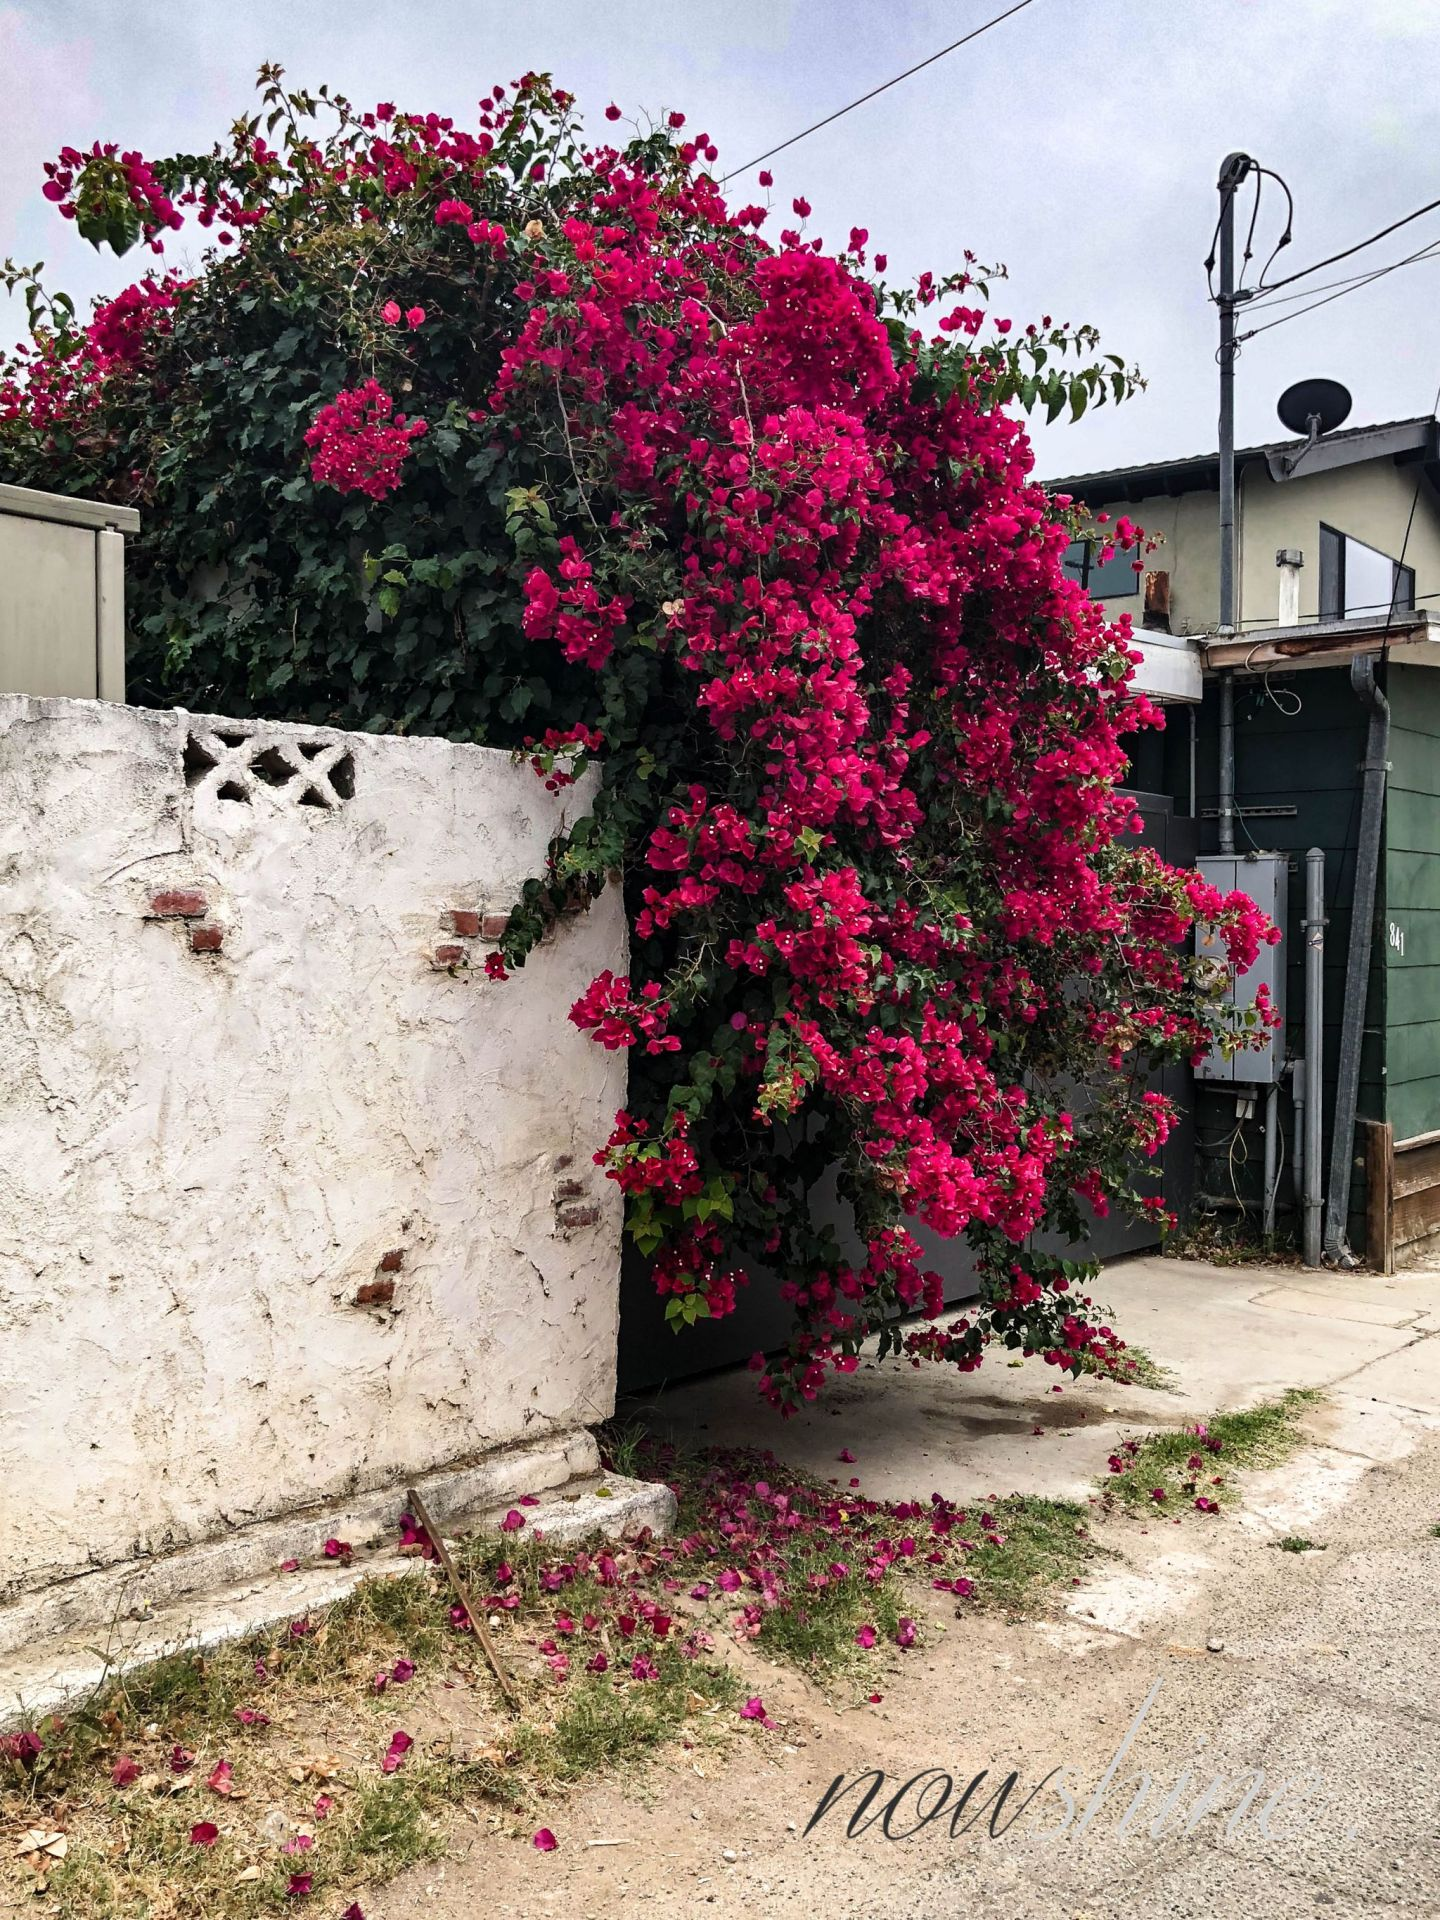 Venice, Los Angeles - Nowshine ü 40 Reiseblog